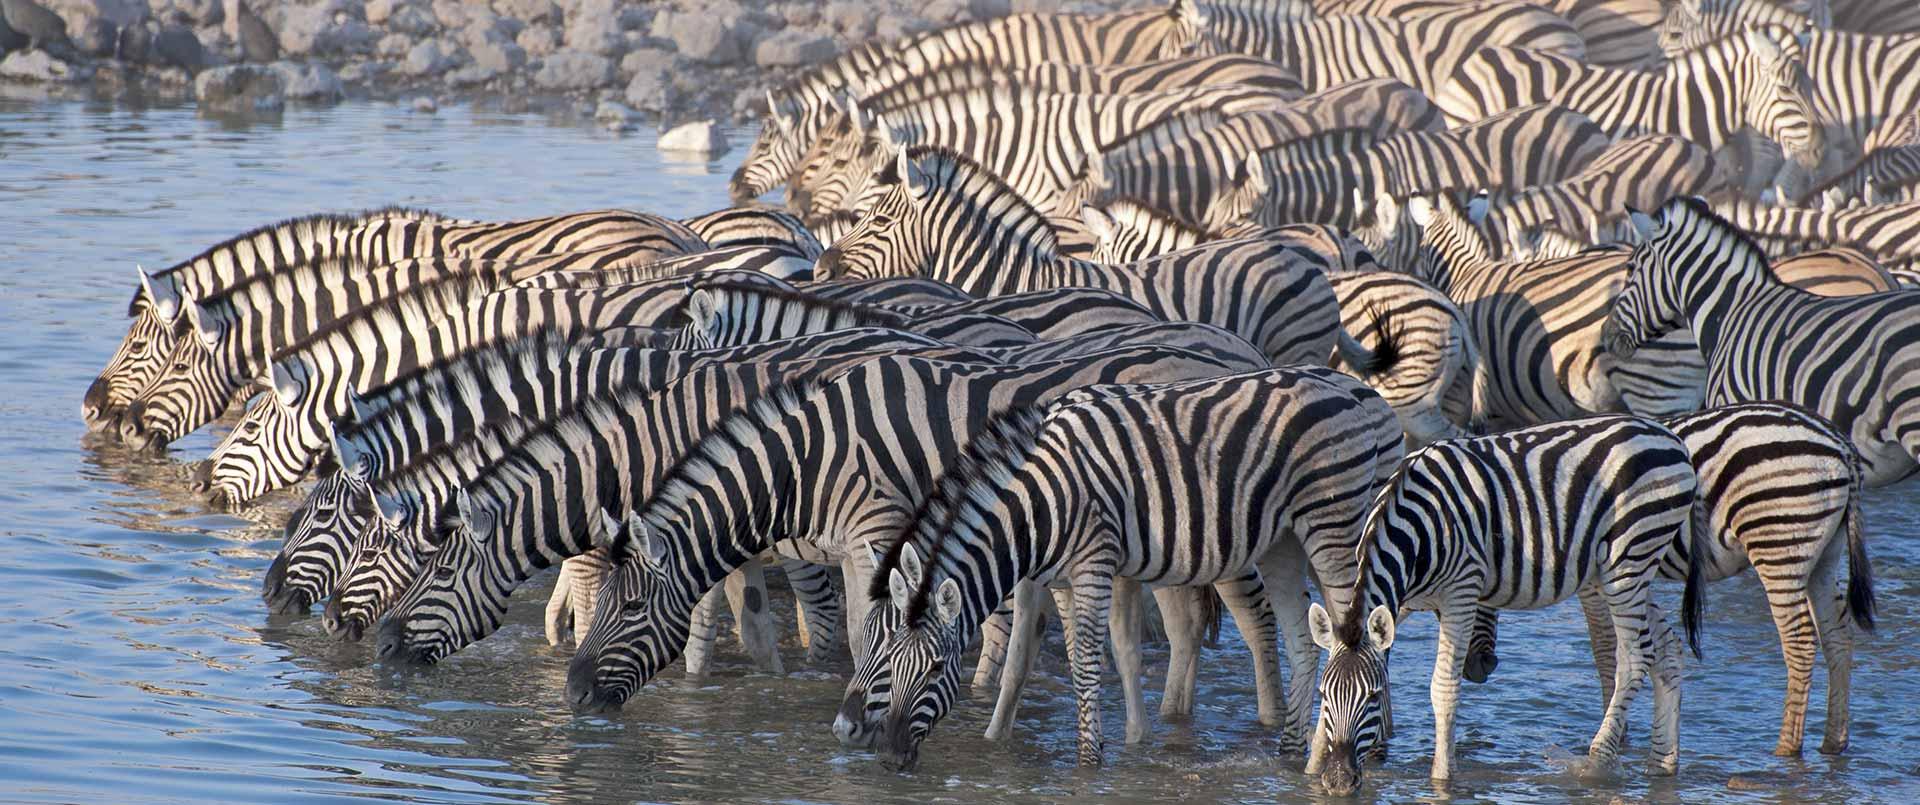 Schoeman Skeleton Coast Safari